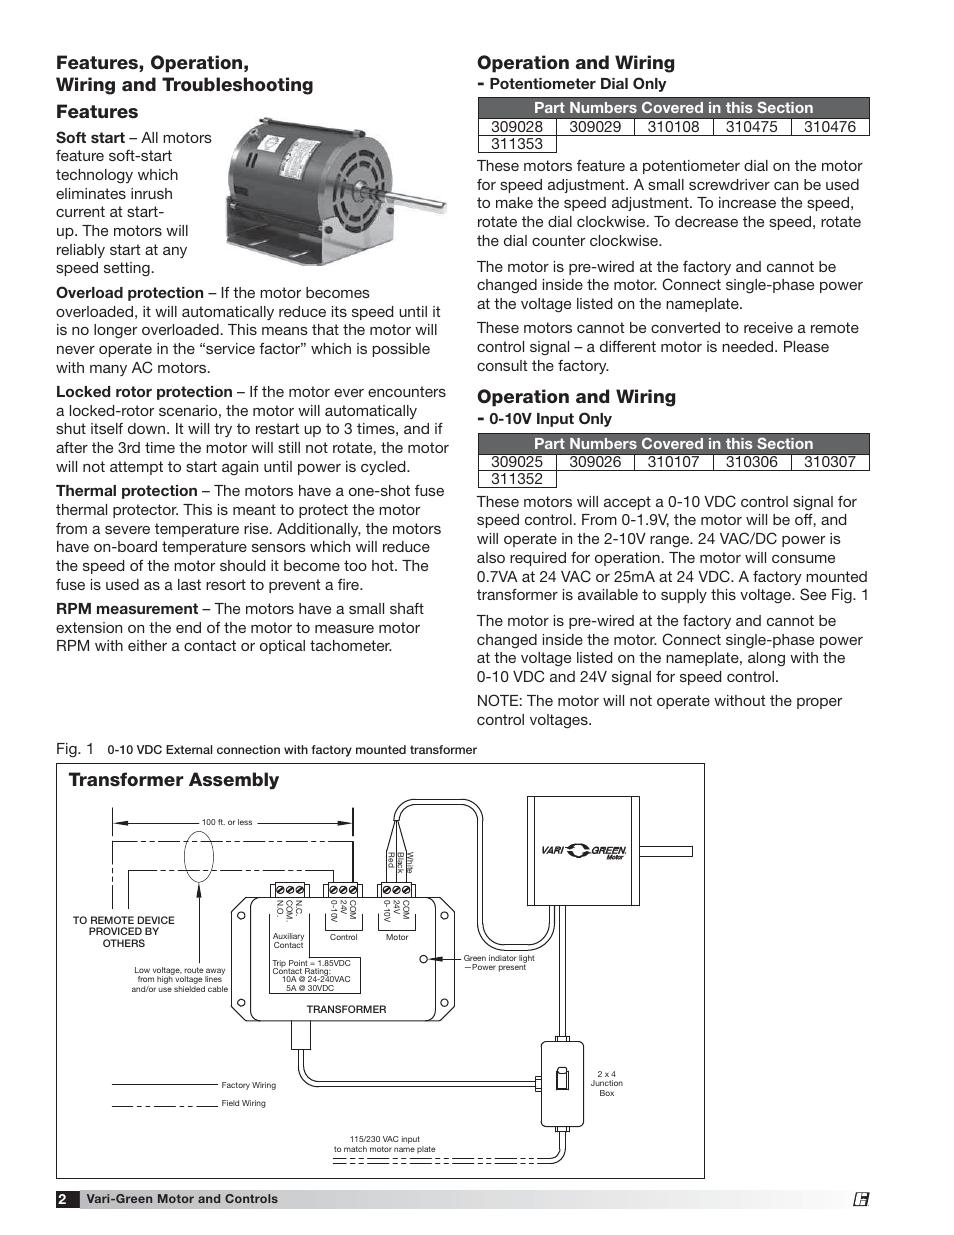 hight resolution of operation and wiring transformer assembly greenheck vari green motor iom 473681